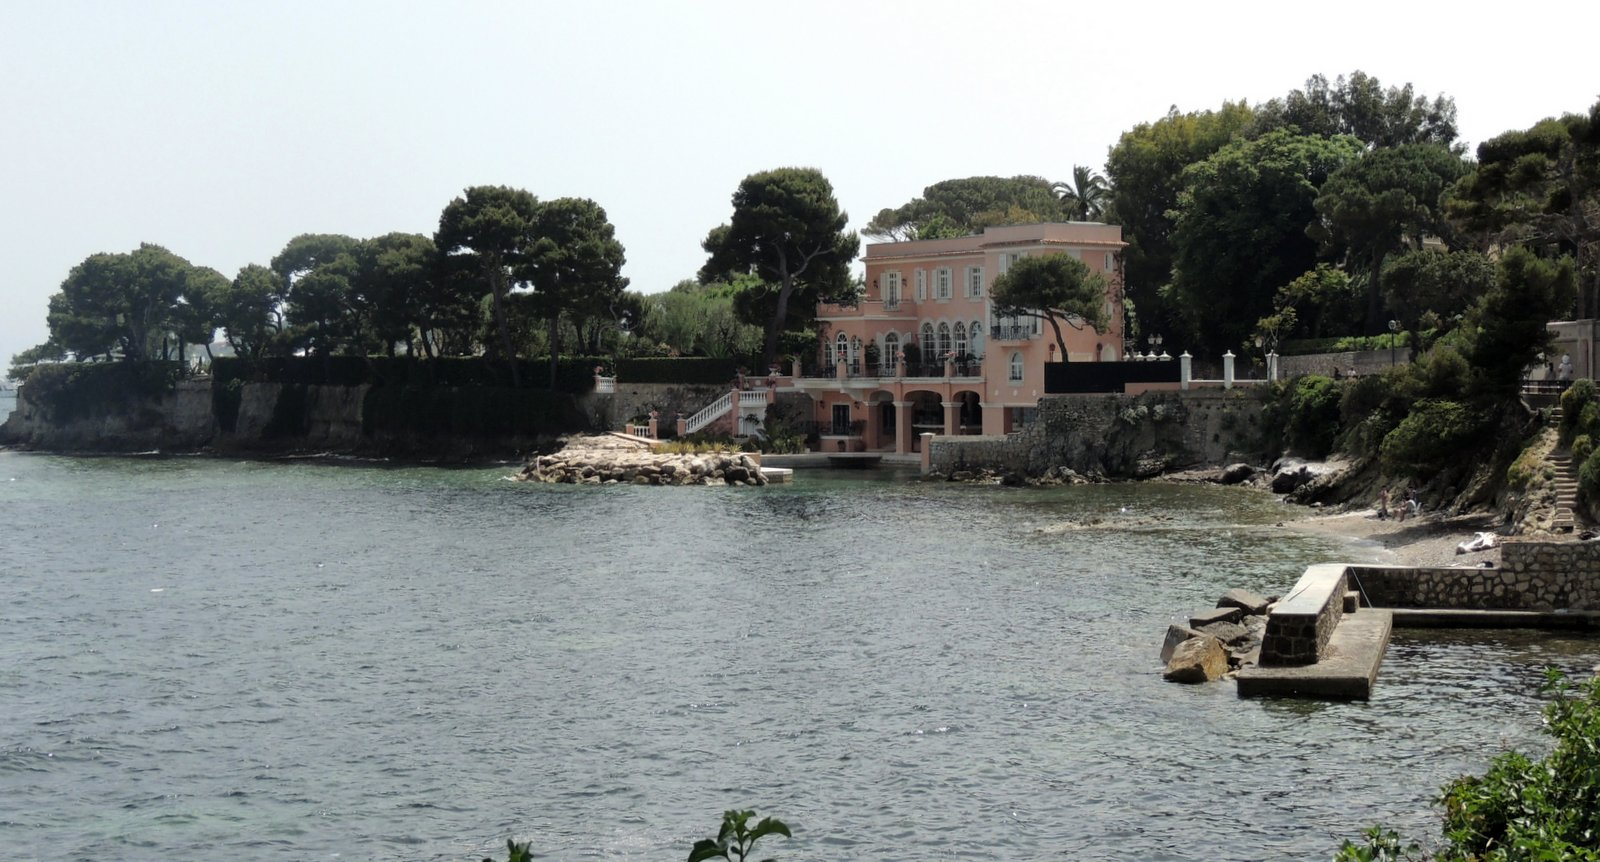 ehemalihge Villa von David Niven - Côte d`Azur